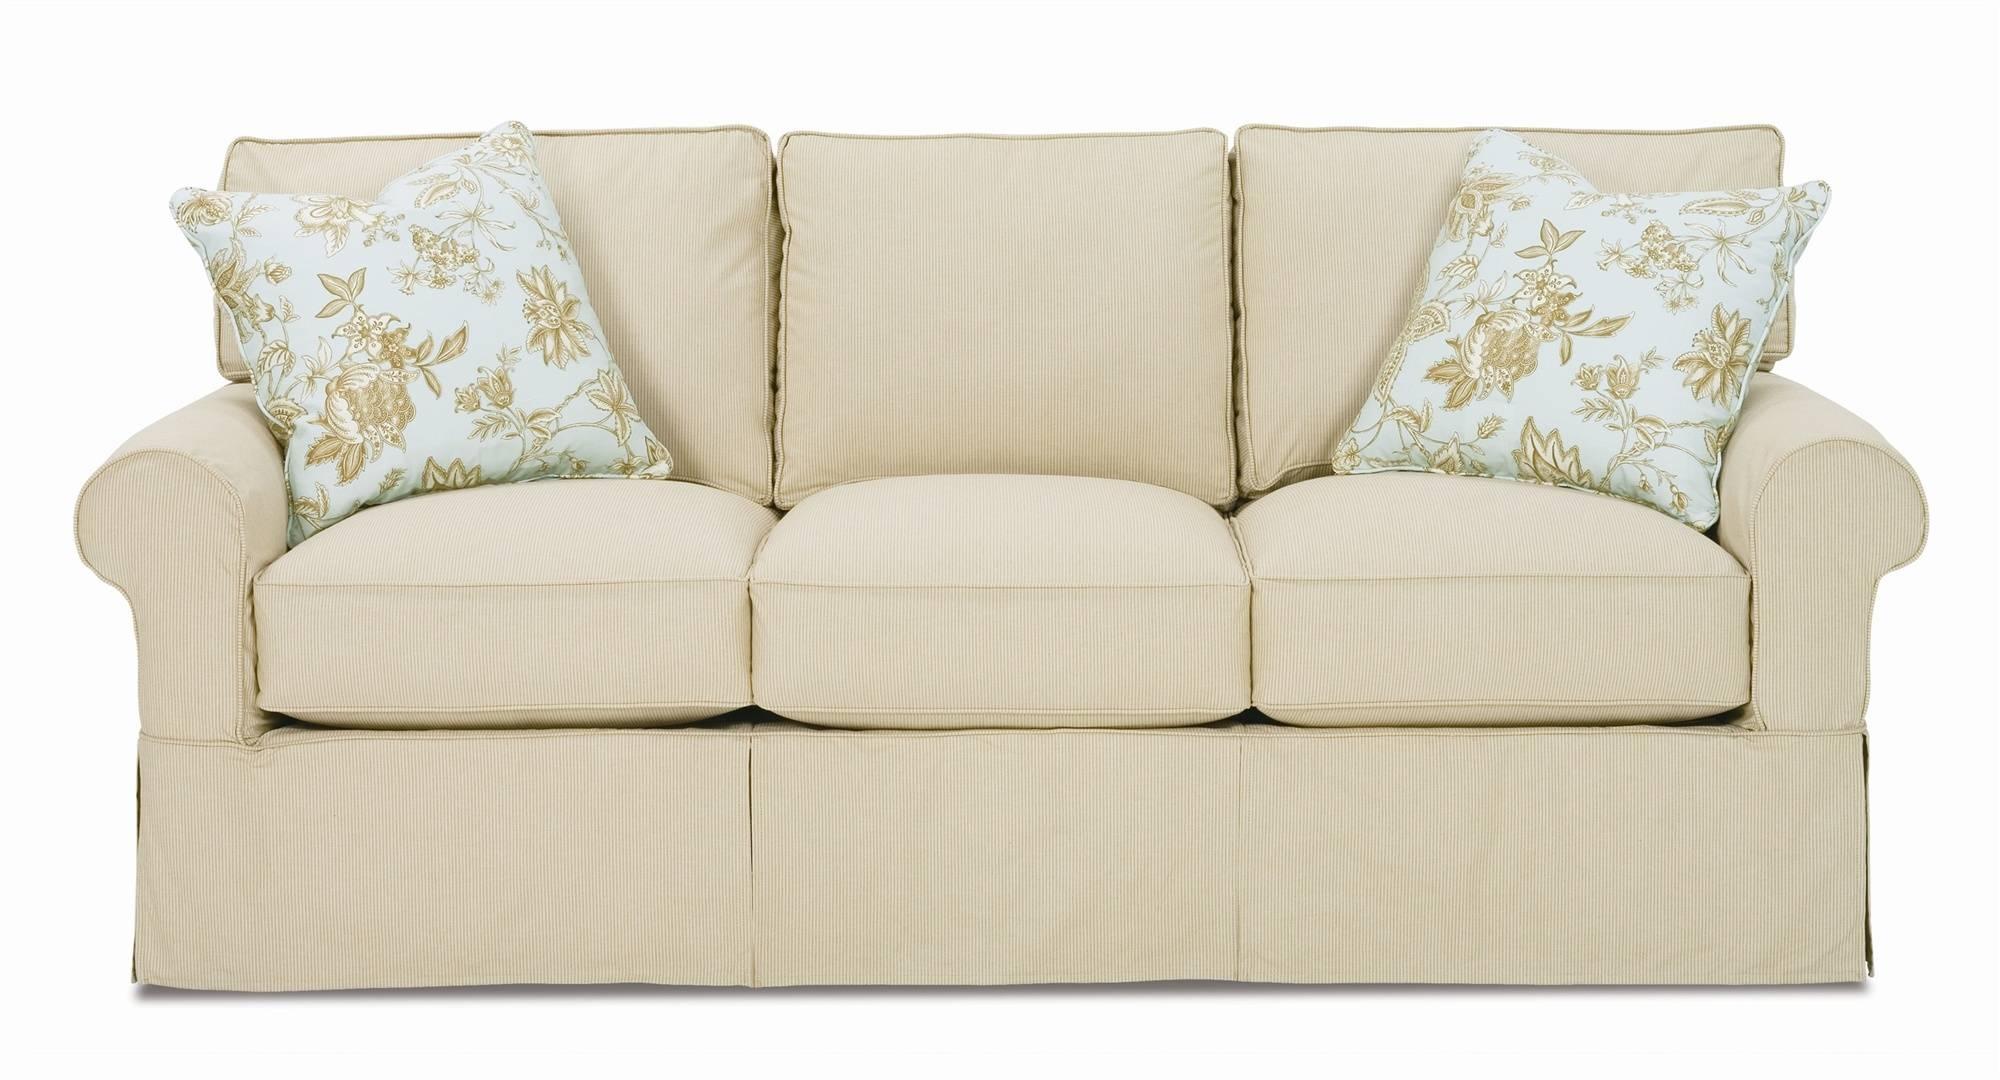 Quality Interiors | Sofa Slipcover | Chair Slipcovers Regarding Shabby Chic Sofa Slipcovers (View 6 of 15)